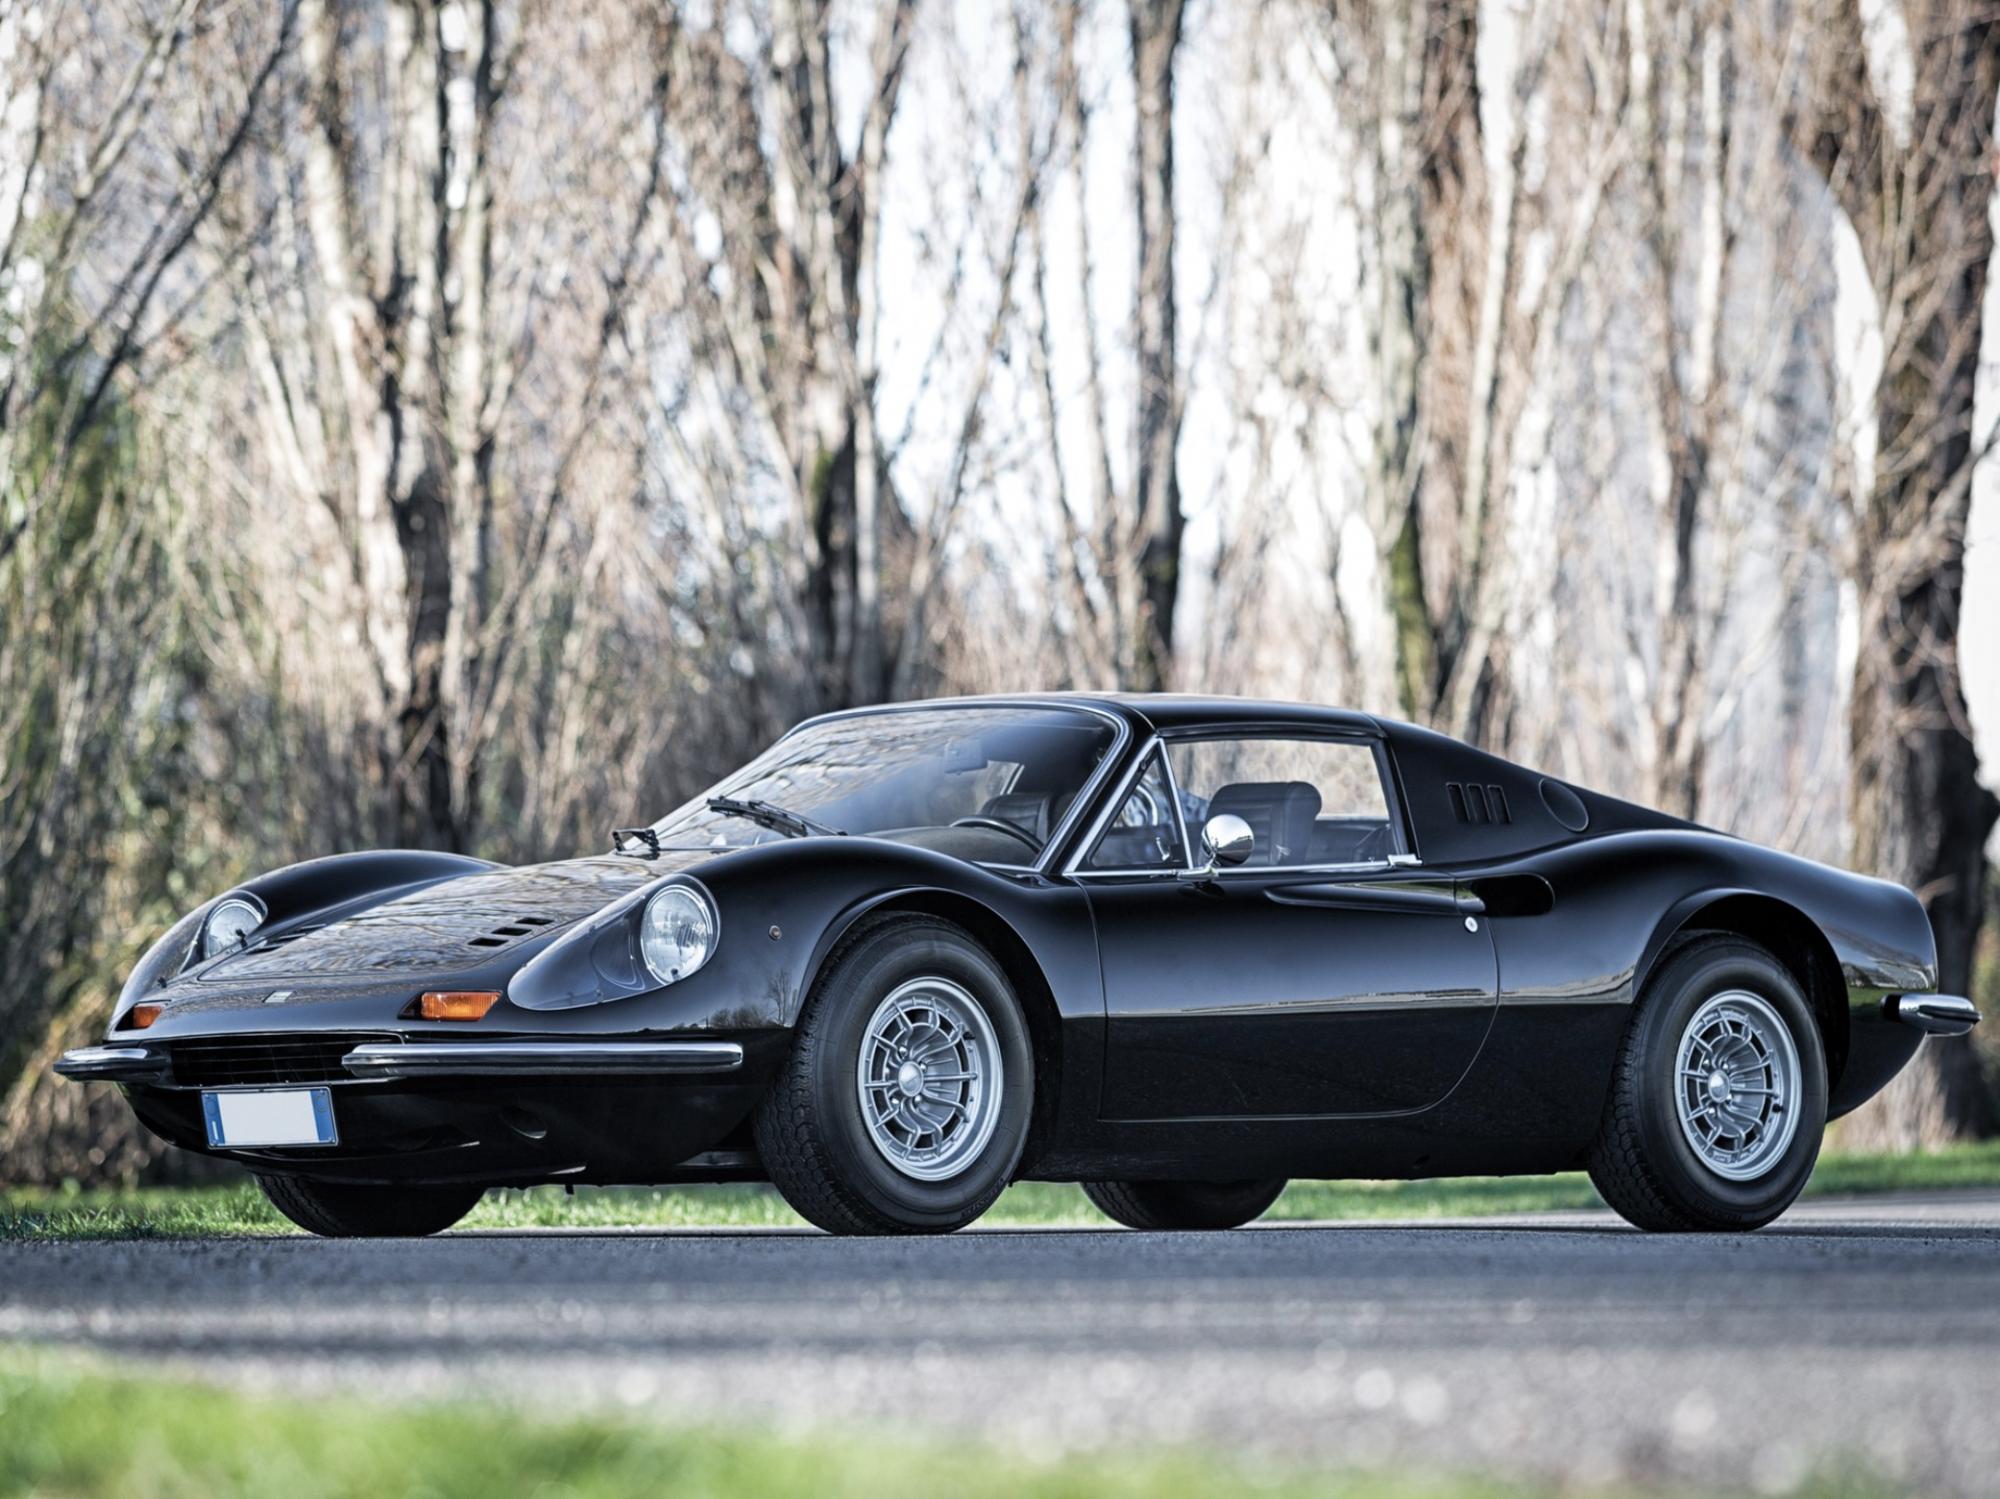 1973 Ferrari Dino 246 GTS for auction (photo: courtesy)